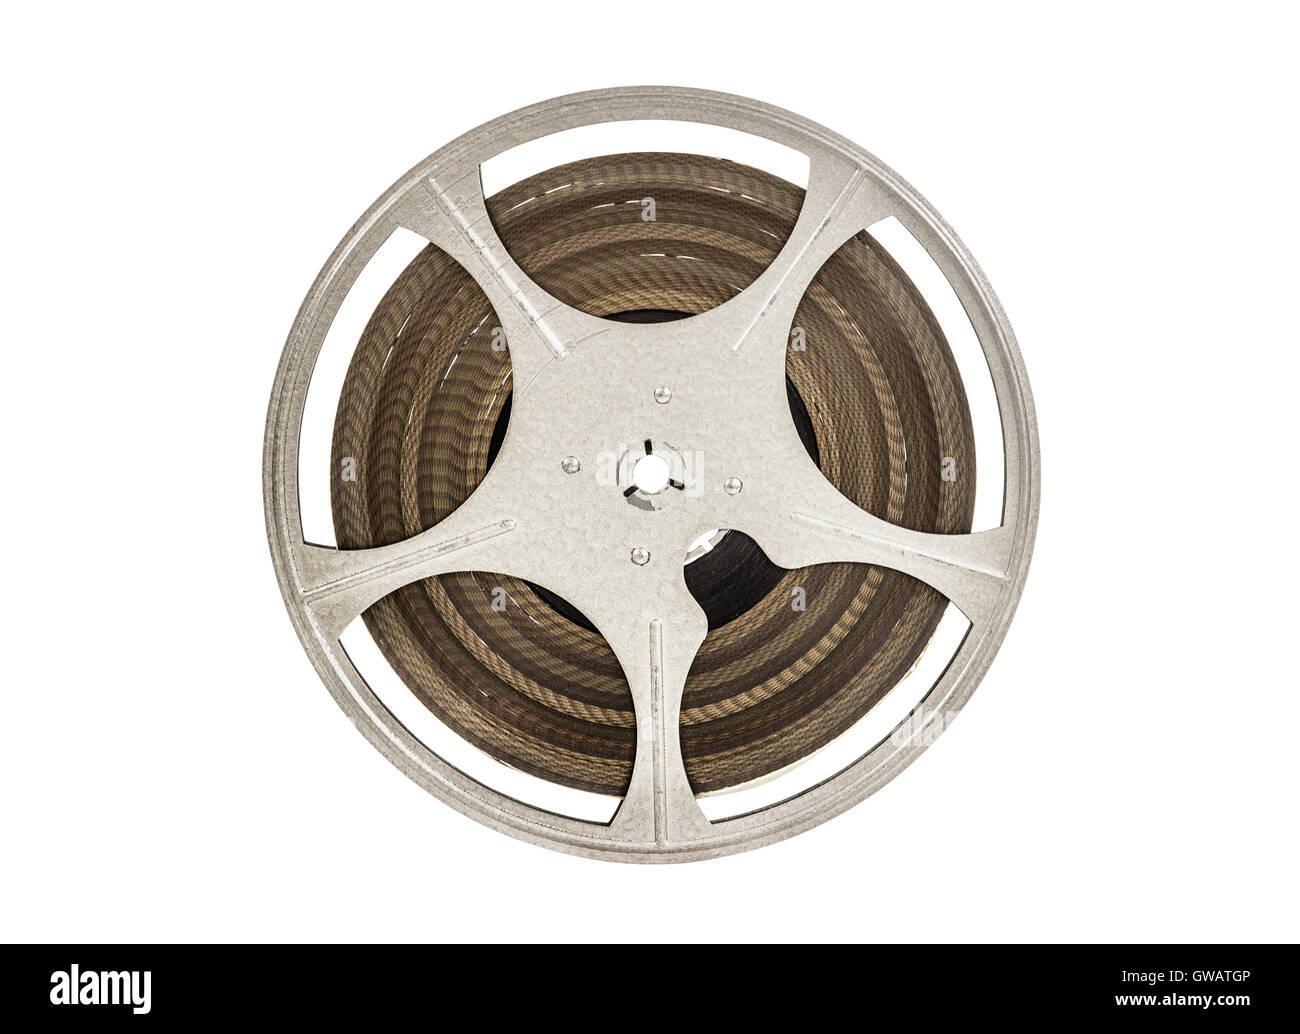 Vintage 8 mm movie film reel isolated on white. - Stock Image